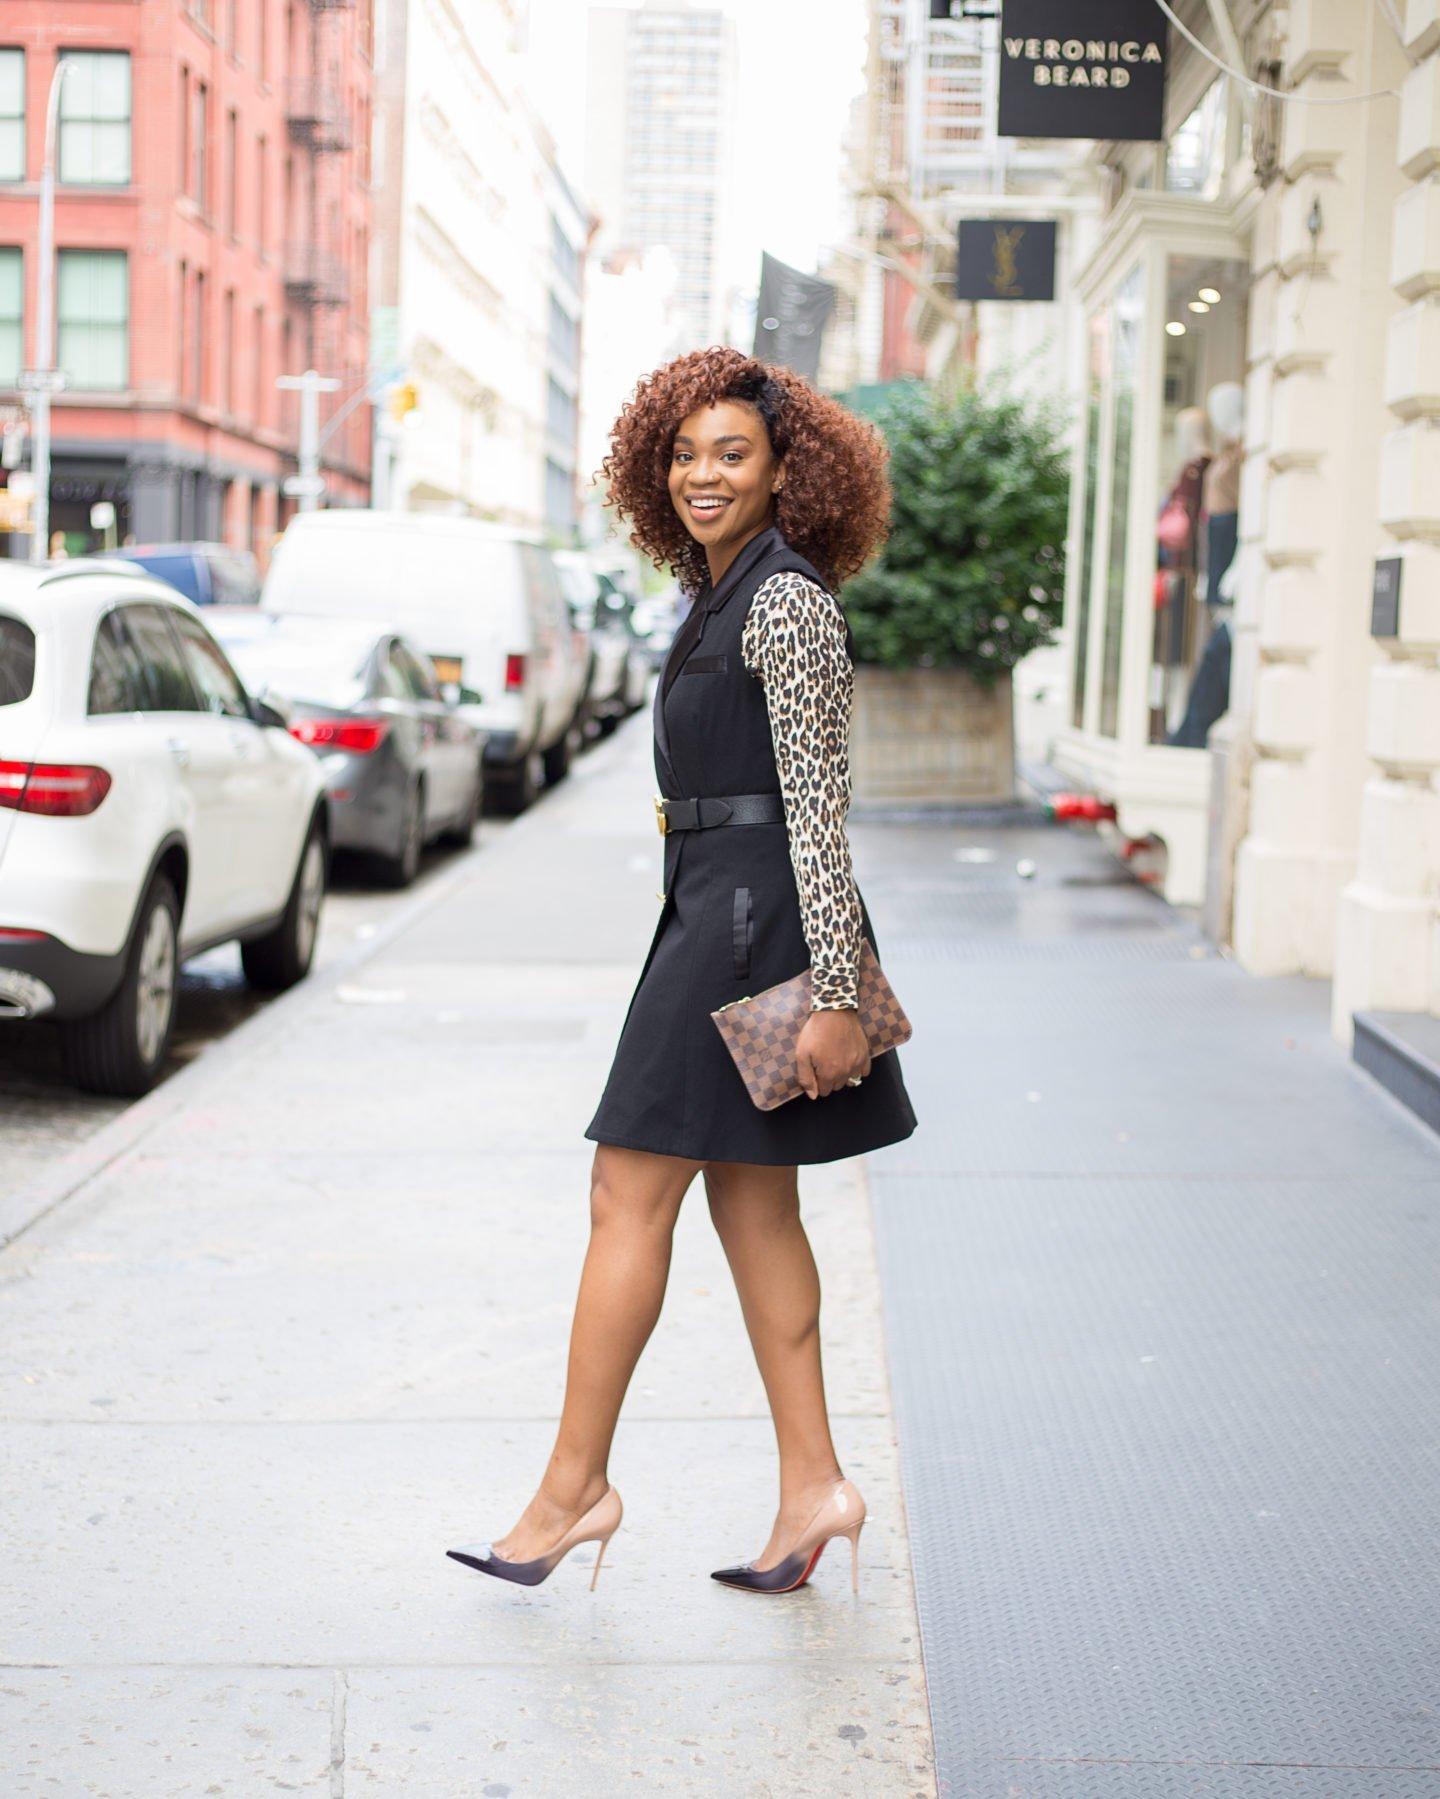 Lifestyle blogger Ijeoma Kola wears Equipment leopard print shirt, Slate & Willow sleeveless blazer dress, Gucci belt, Louis Vuitton zip pouch, and Louboutin decollete 554